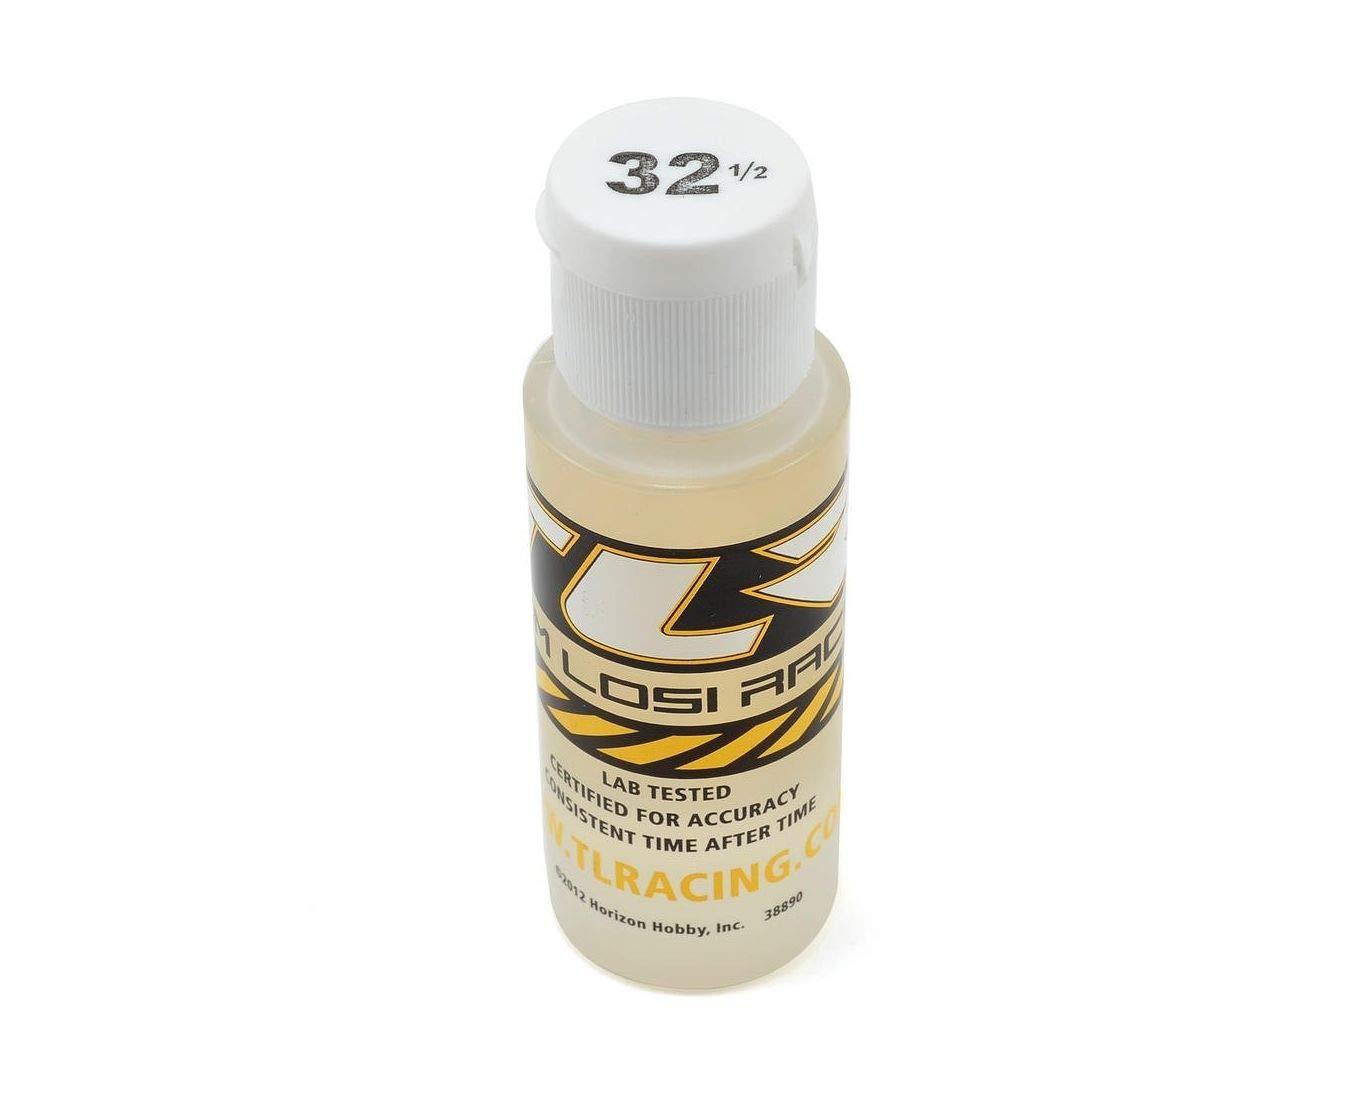 TL74007 TLR74007 TTeam Losii Racing Silicone Shock Oil (2oz) (32